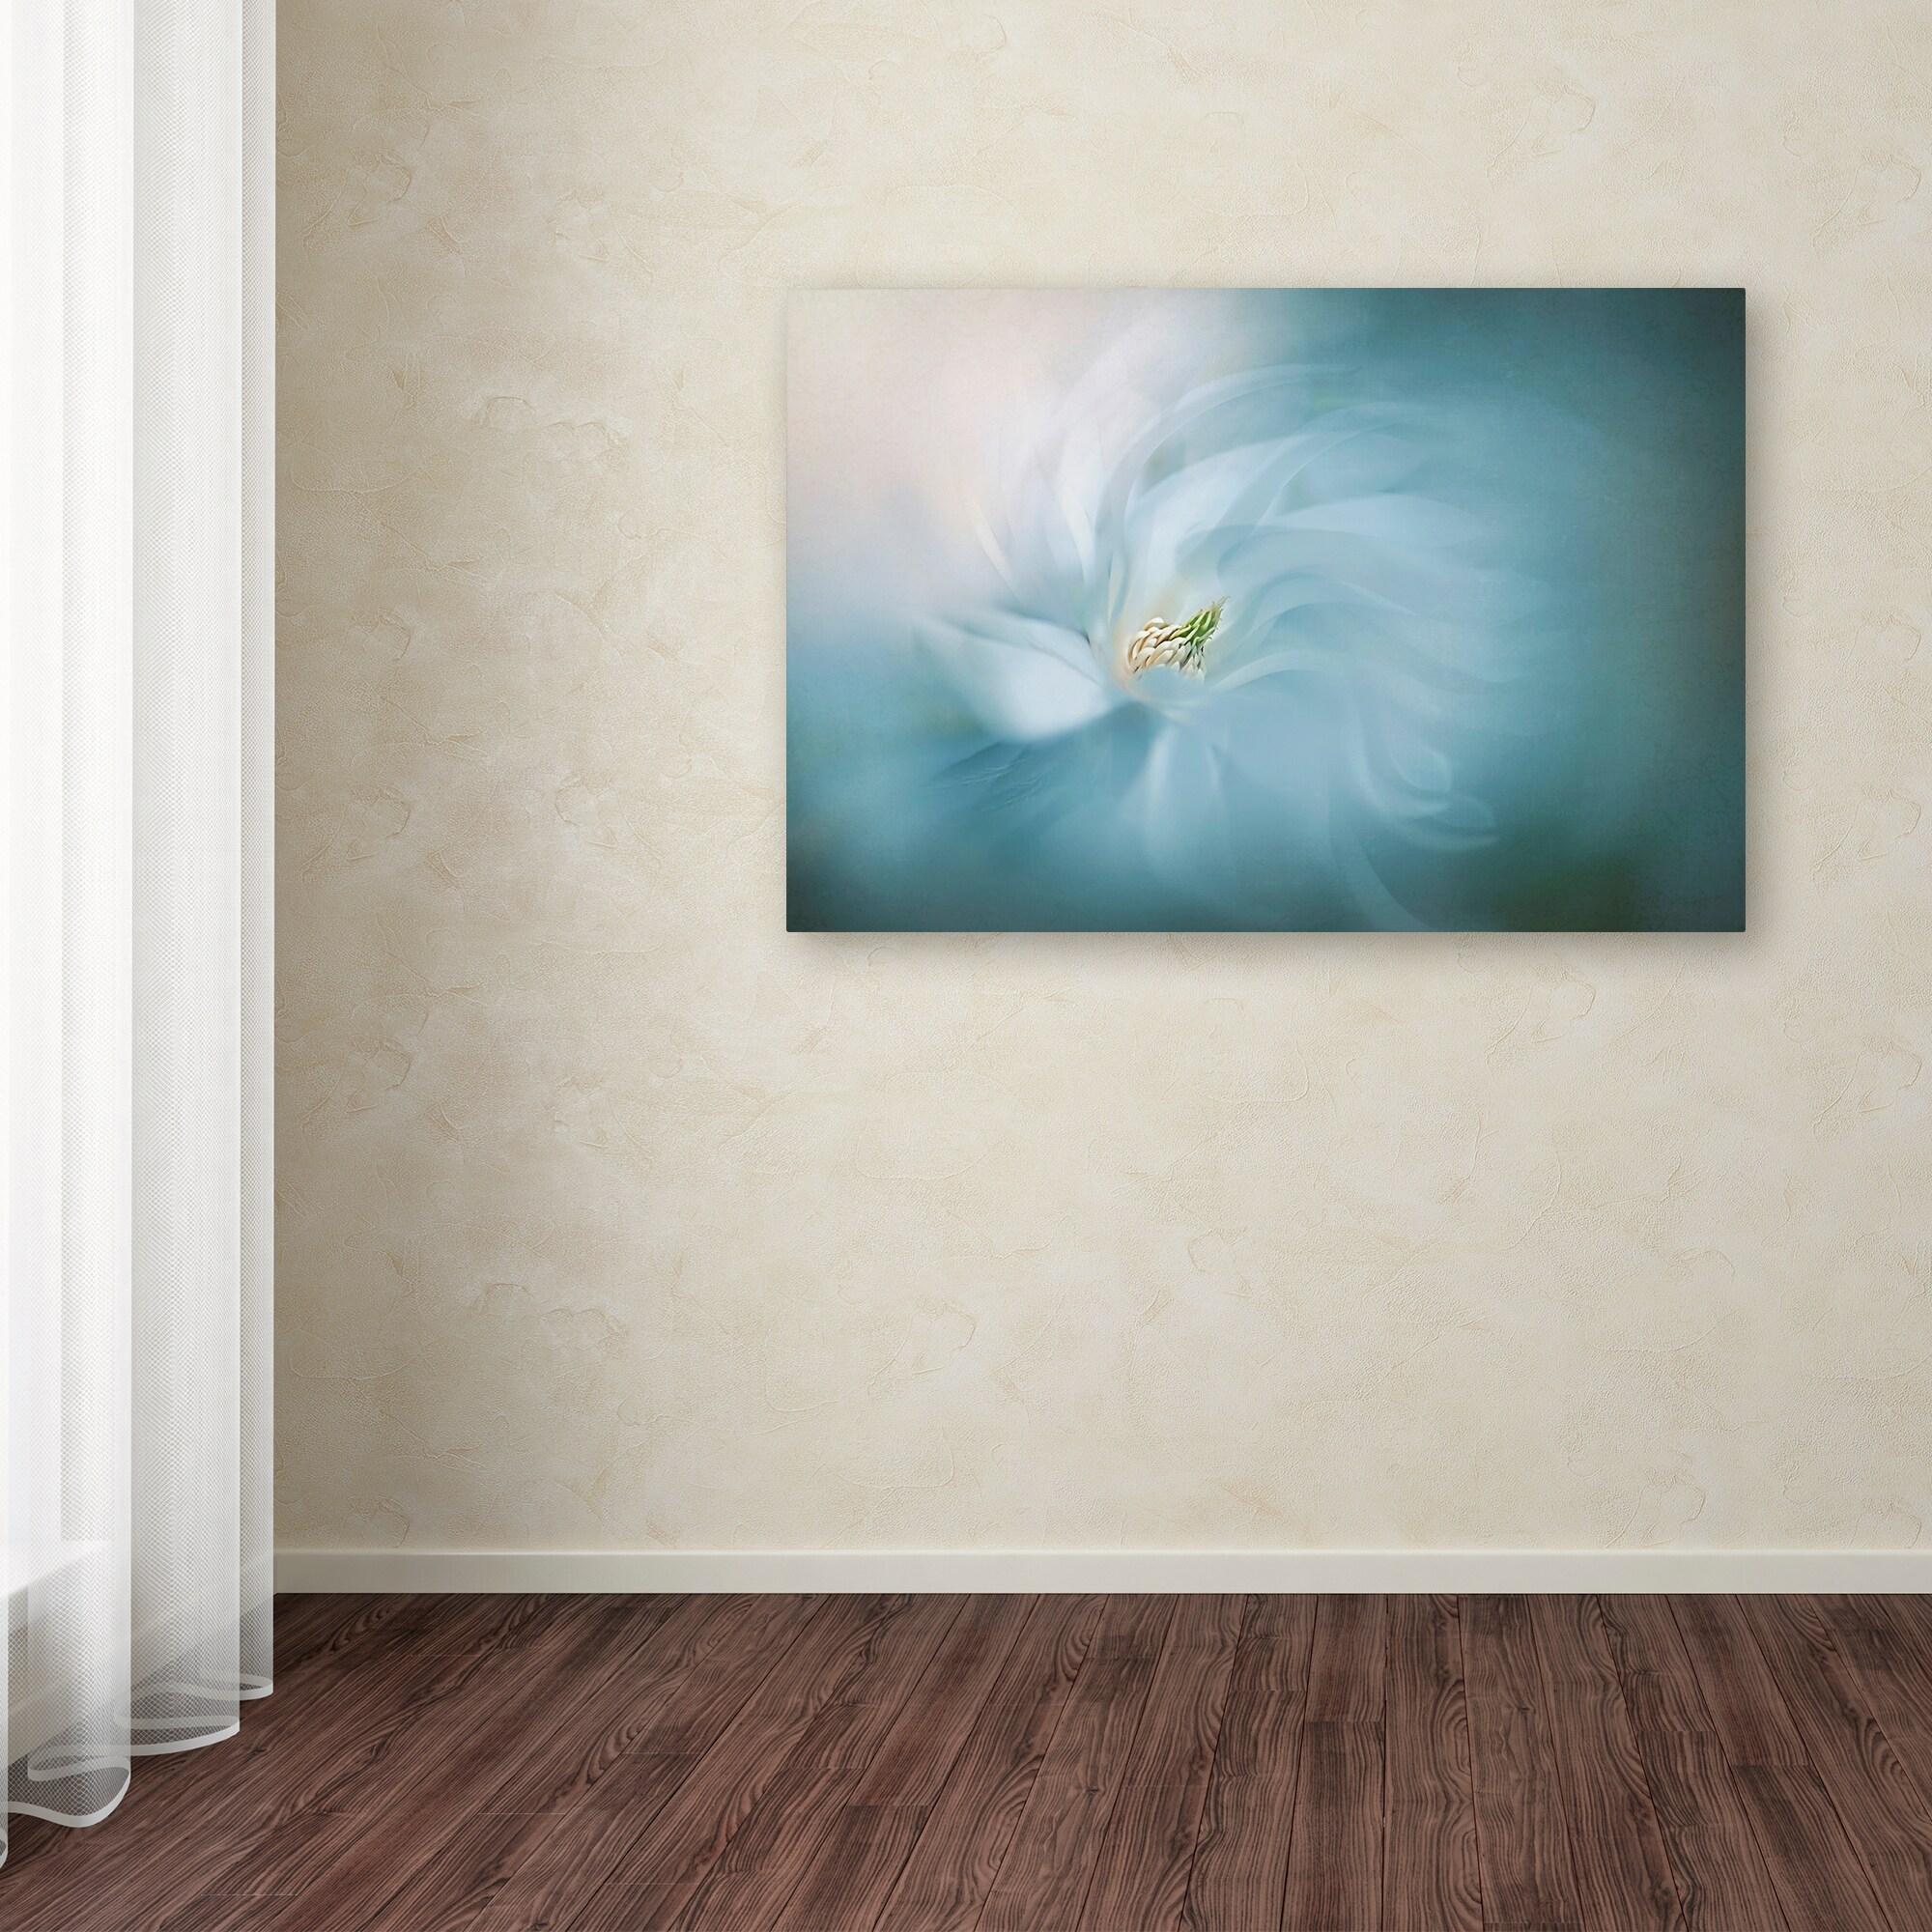 Shop Jacky Parker u0027Sereneu0027 Canvas Art - On Sale - Free Shipping On Orders Over $45 - Overstock.com - 16720683 & Shop Jacky Parker u0027Sereneu0027 Canvas Art - On Sale - Free Shipping On ...